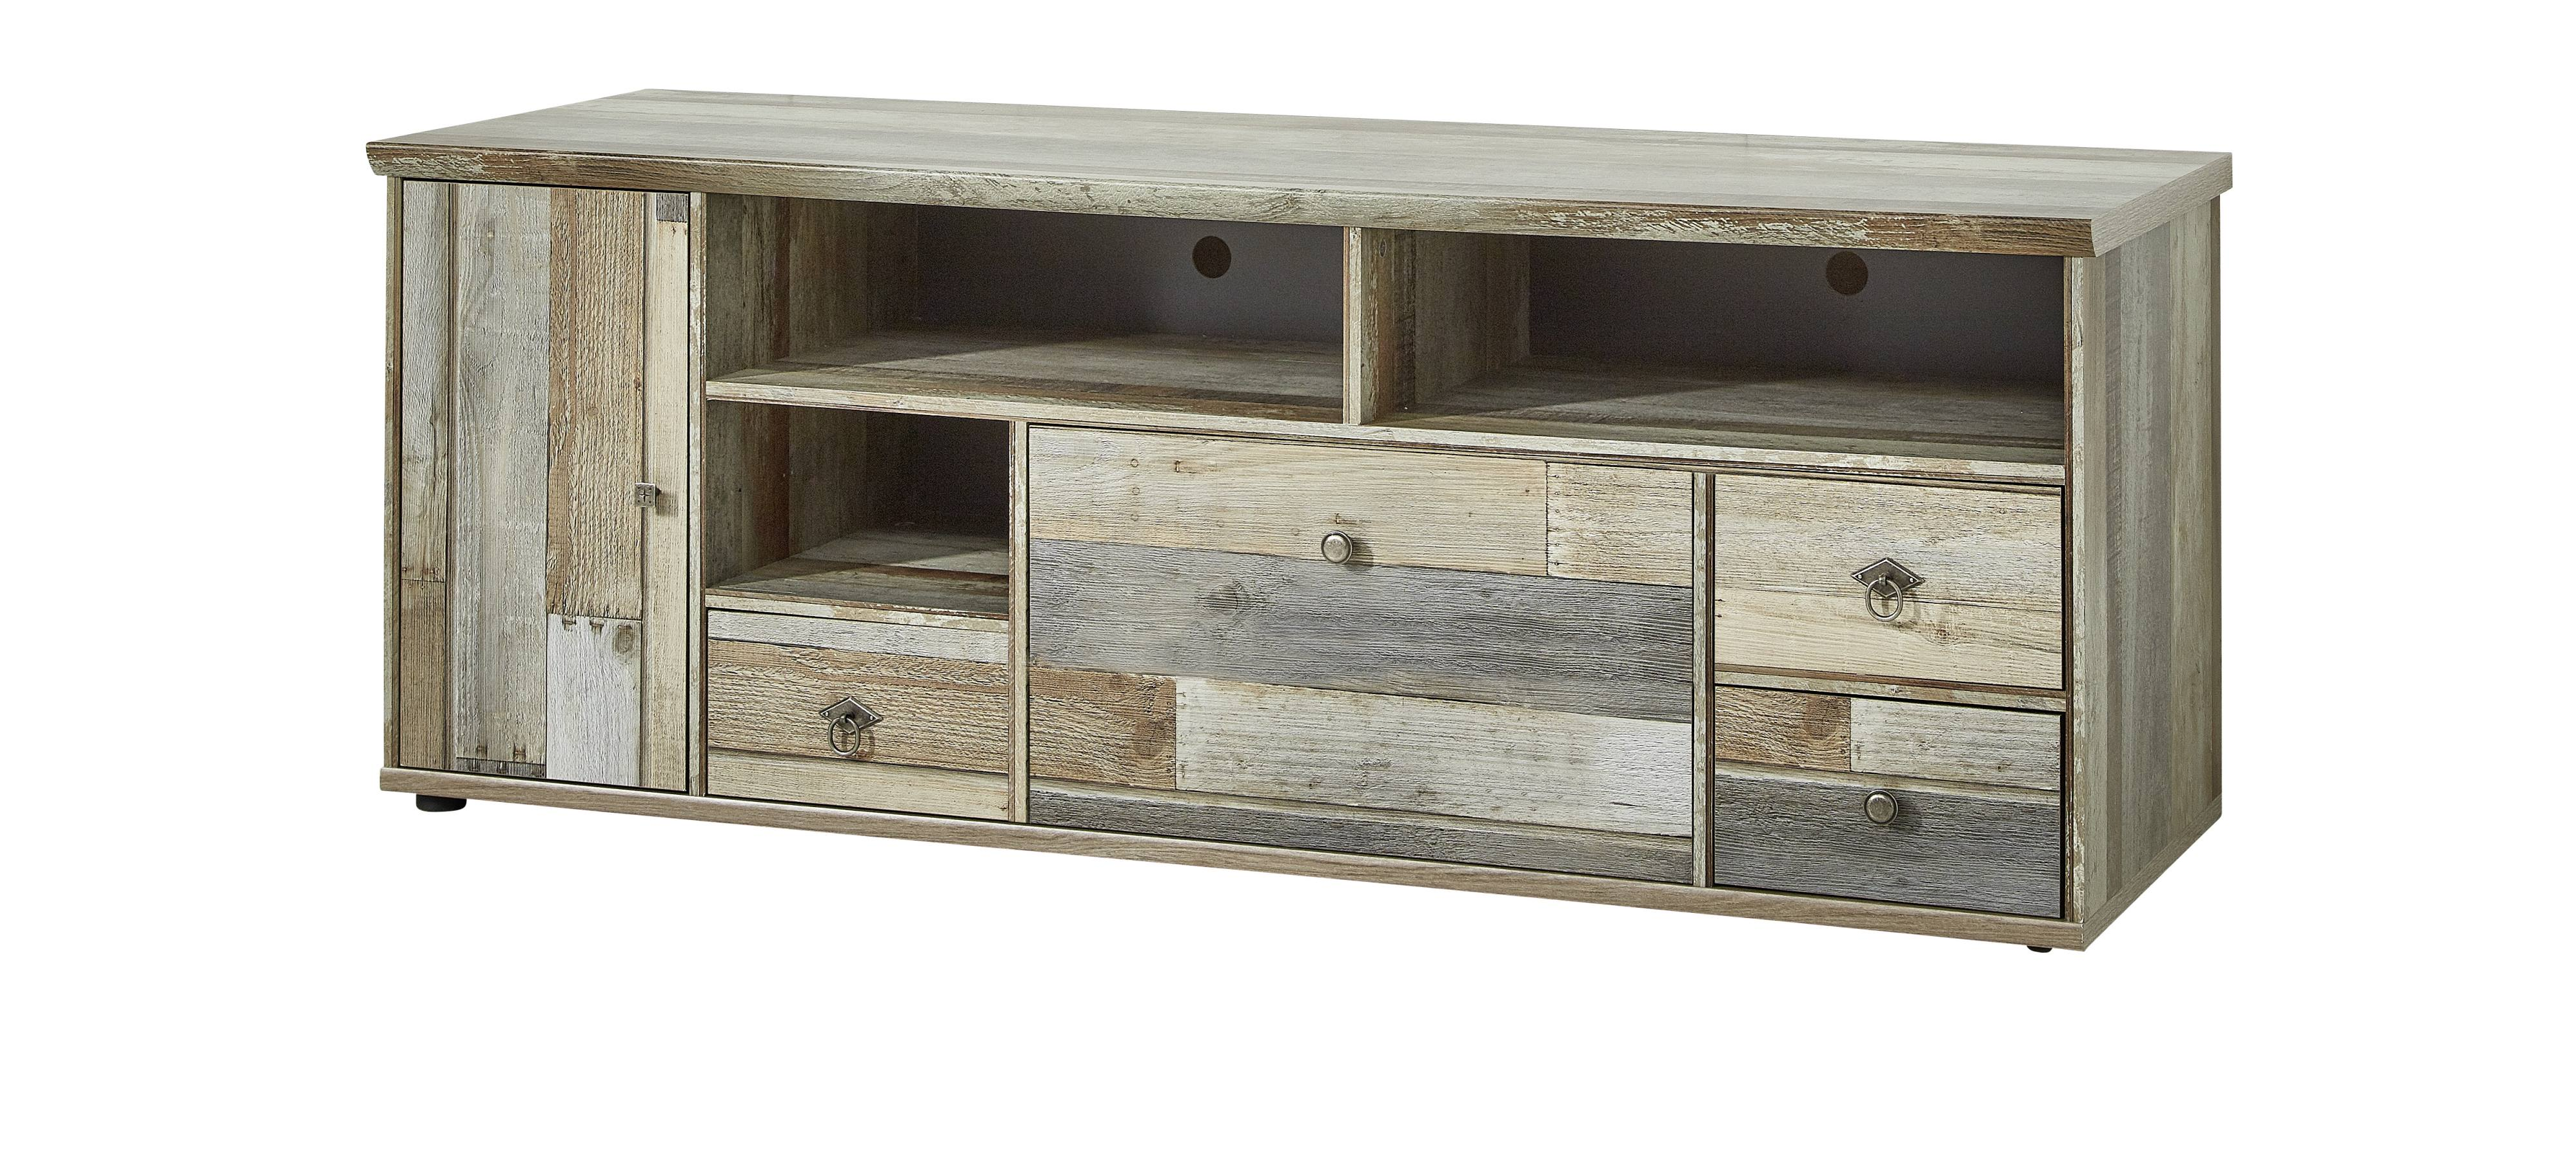 wohnwand wohnzimmer set 3 tlg kommode lowboard wandregal vintage shabby ebay. Black Bedroom Furniture Sets. Home Design Ideas